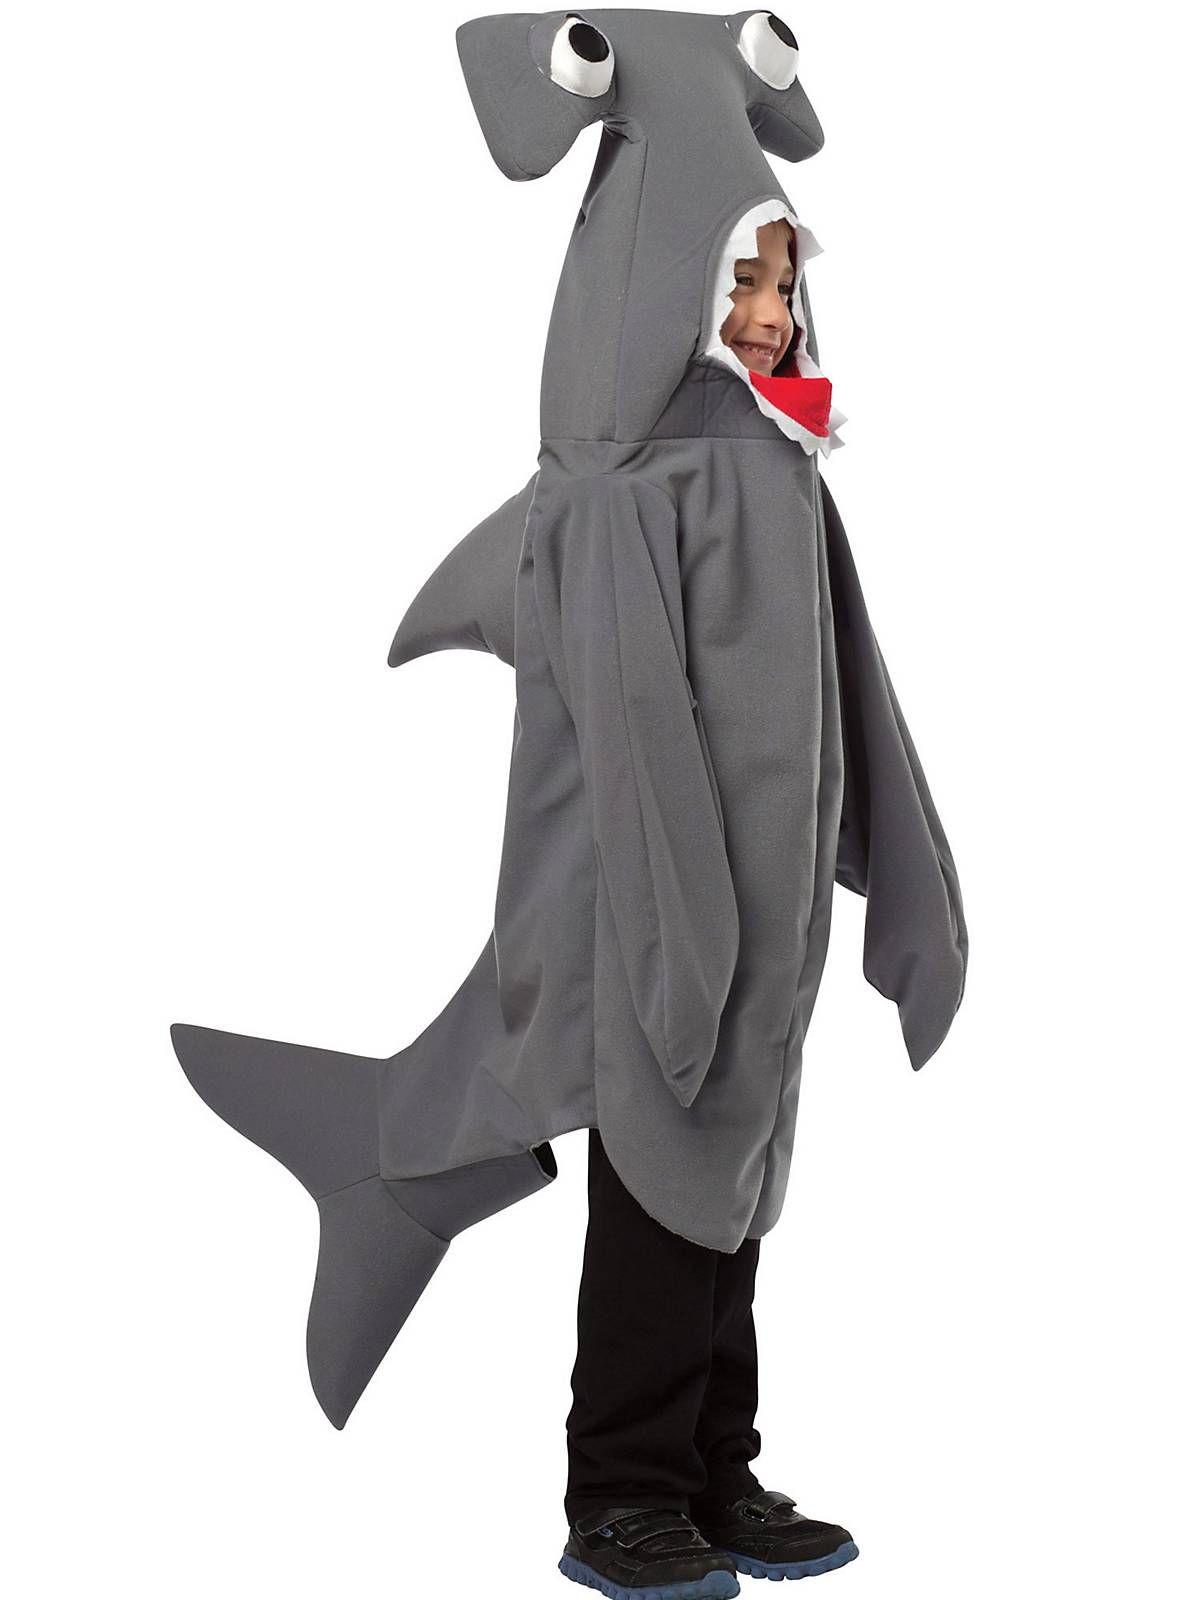 Hammerhead Shark Costume | Wholesale Animal Costumes for ...